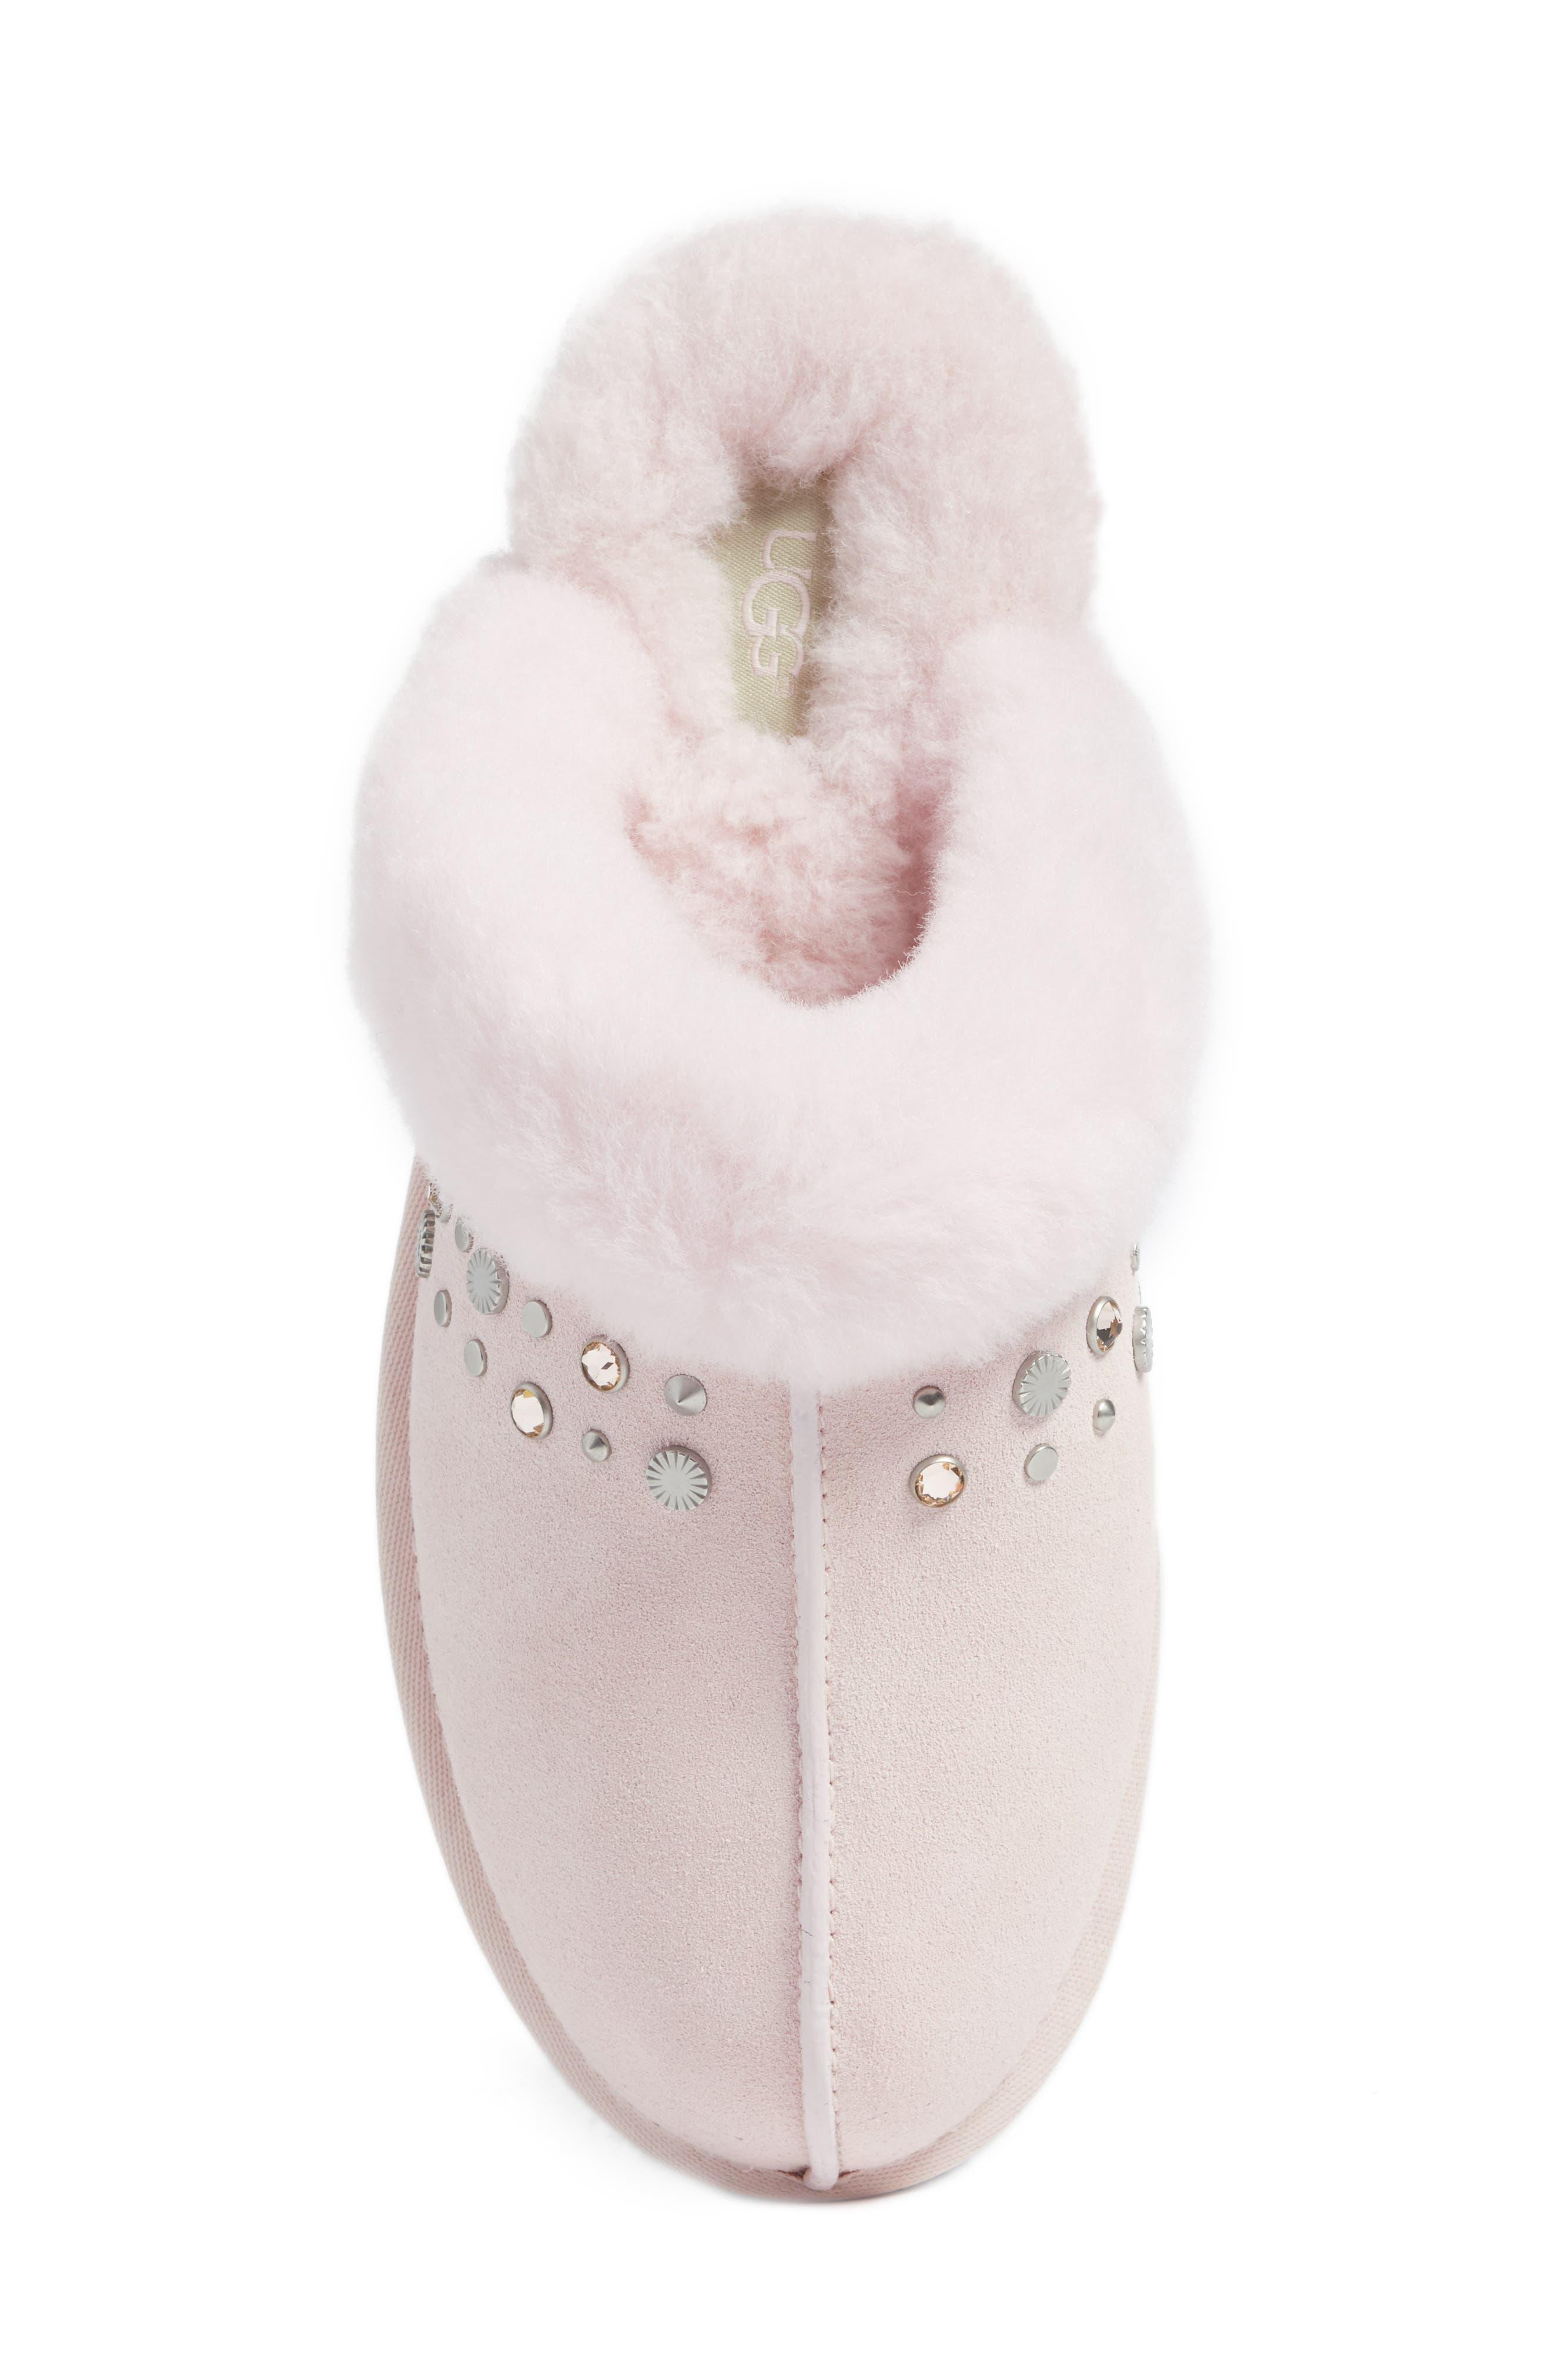 Scuffette II Studded Slipper,                             Alternate thumbnail 6, color,                             Seashell Pink